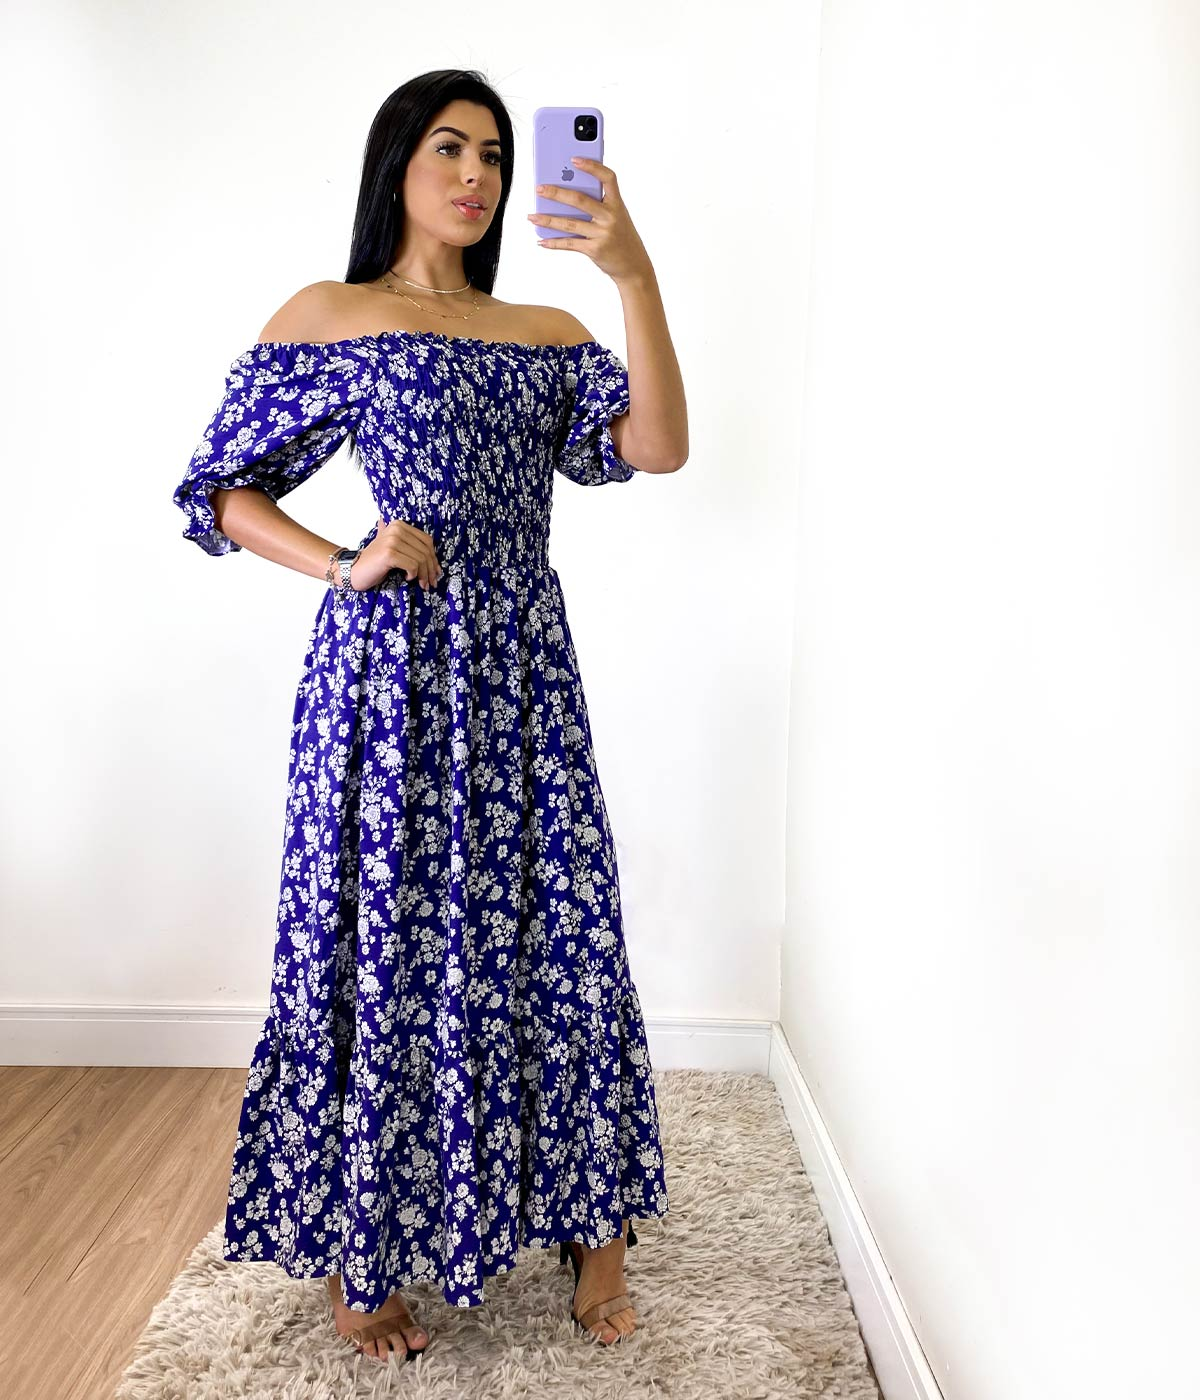 Vestido Longo Lastex Manga Bufante Florido Azul Marinho